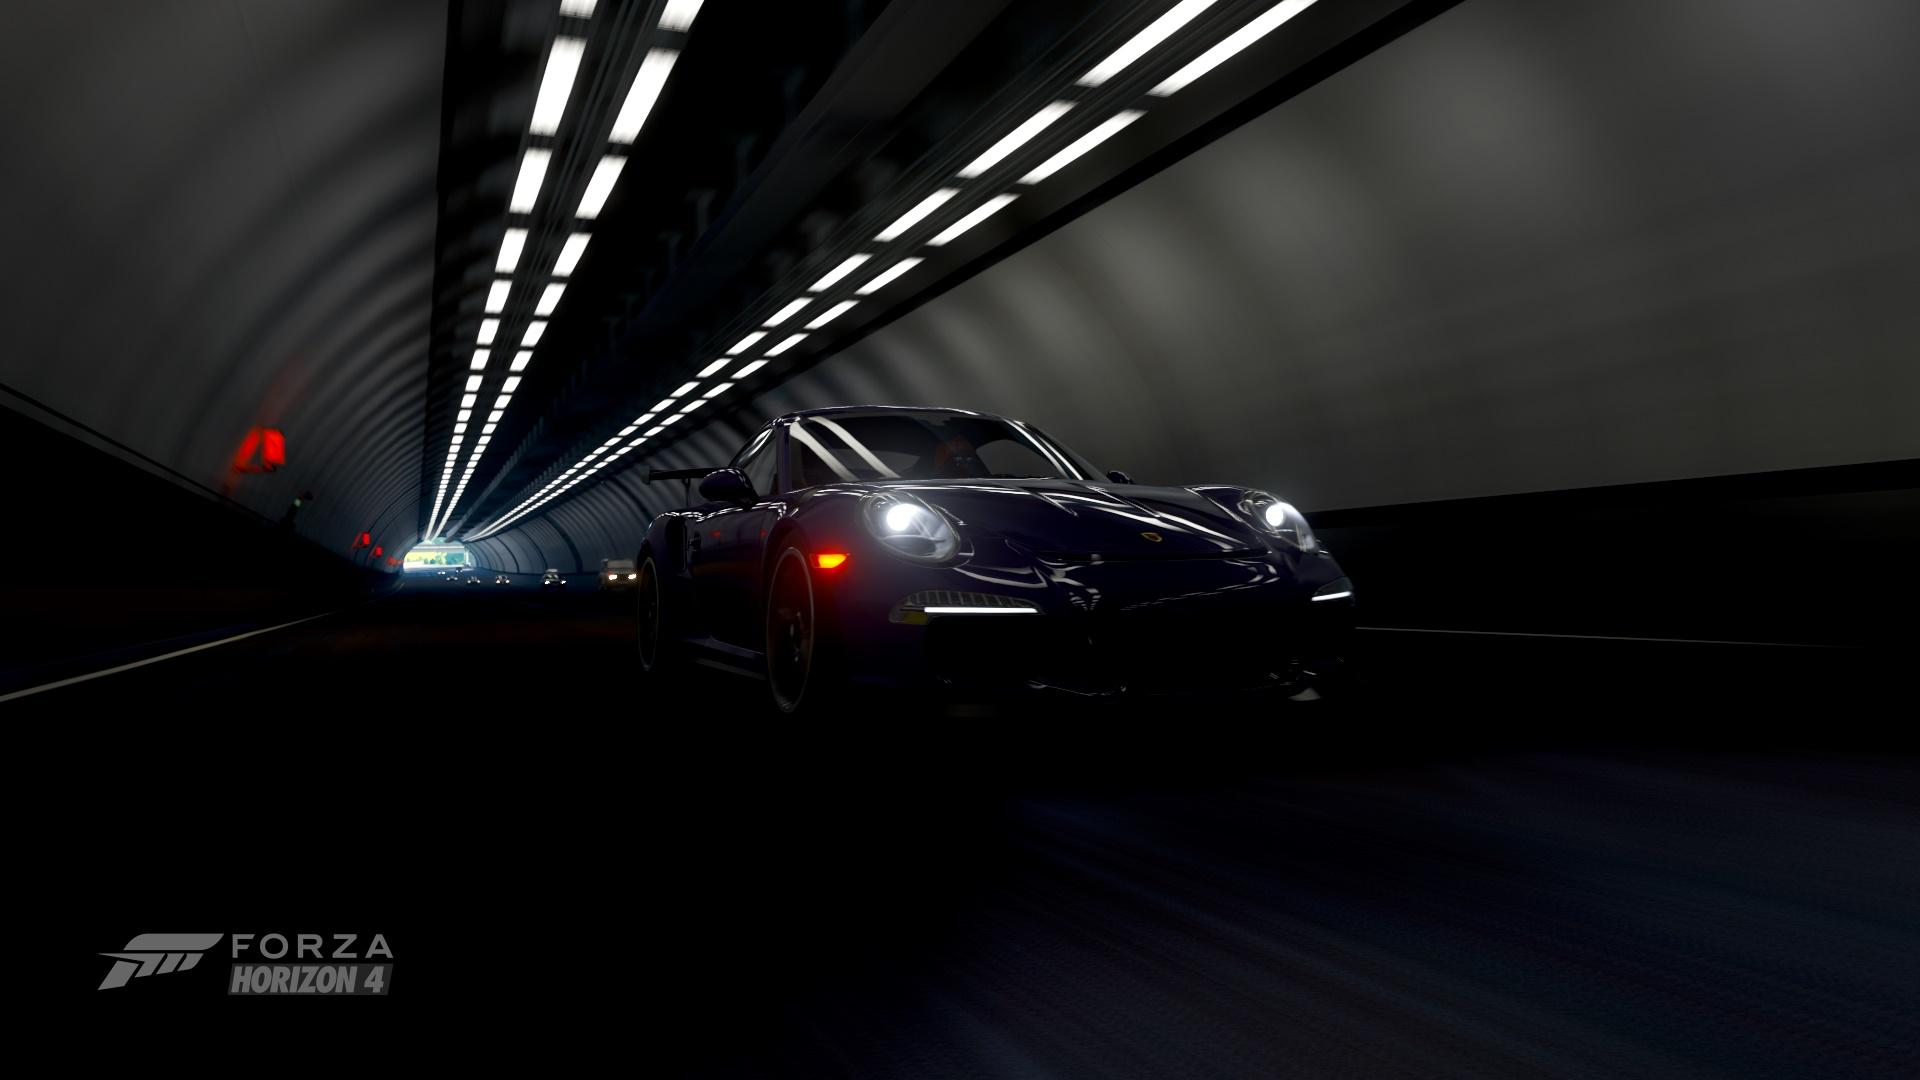 Wallpaper : Forza Horizon 4, Porsche 911 GT3 RS, video ...